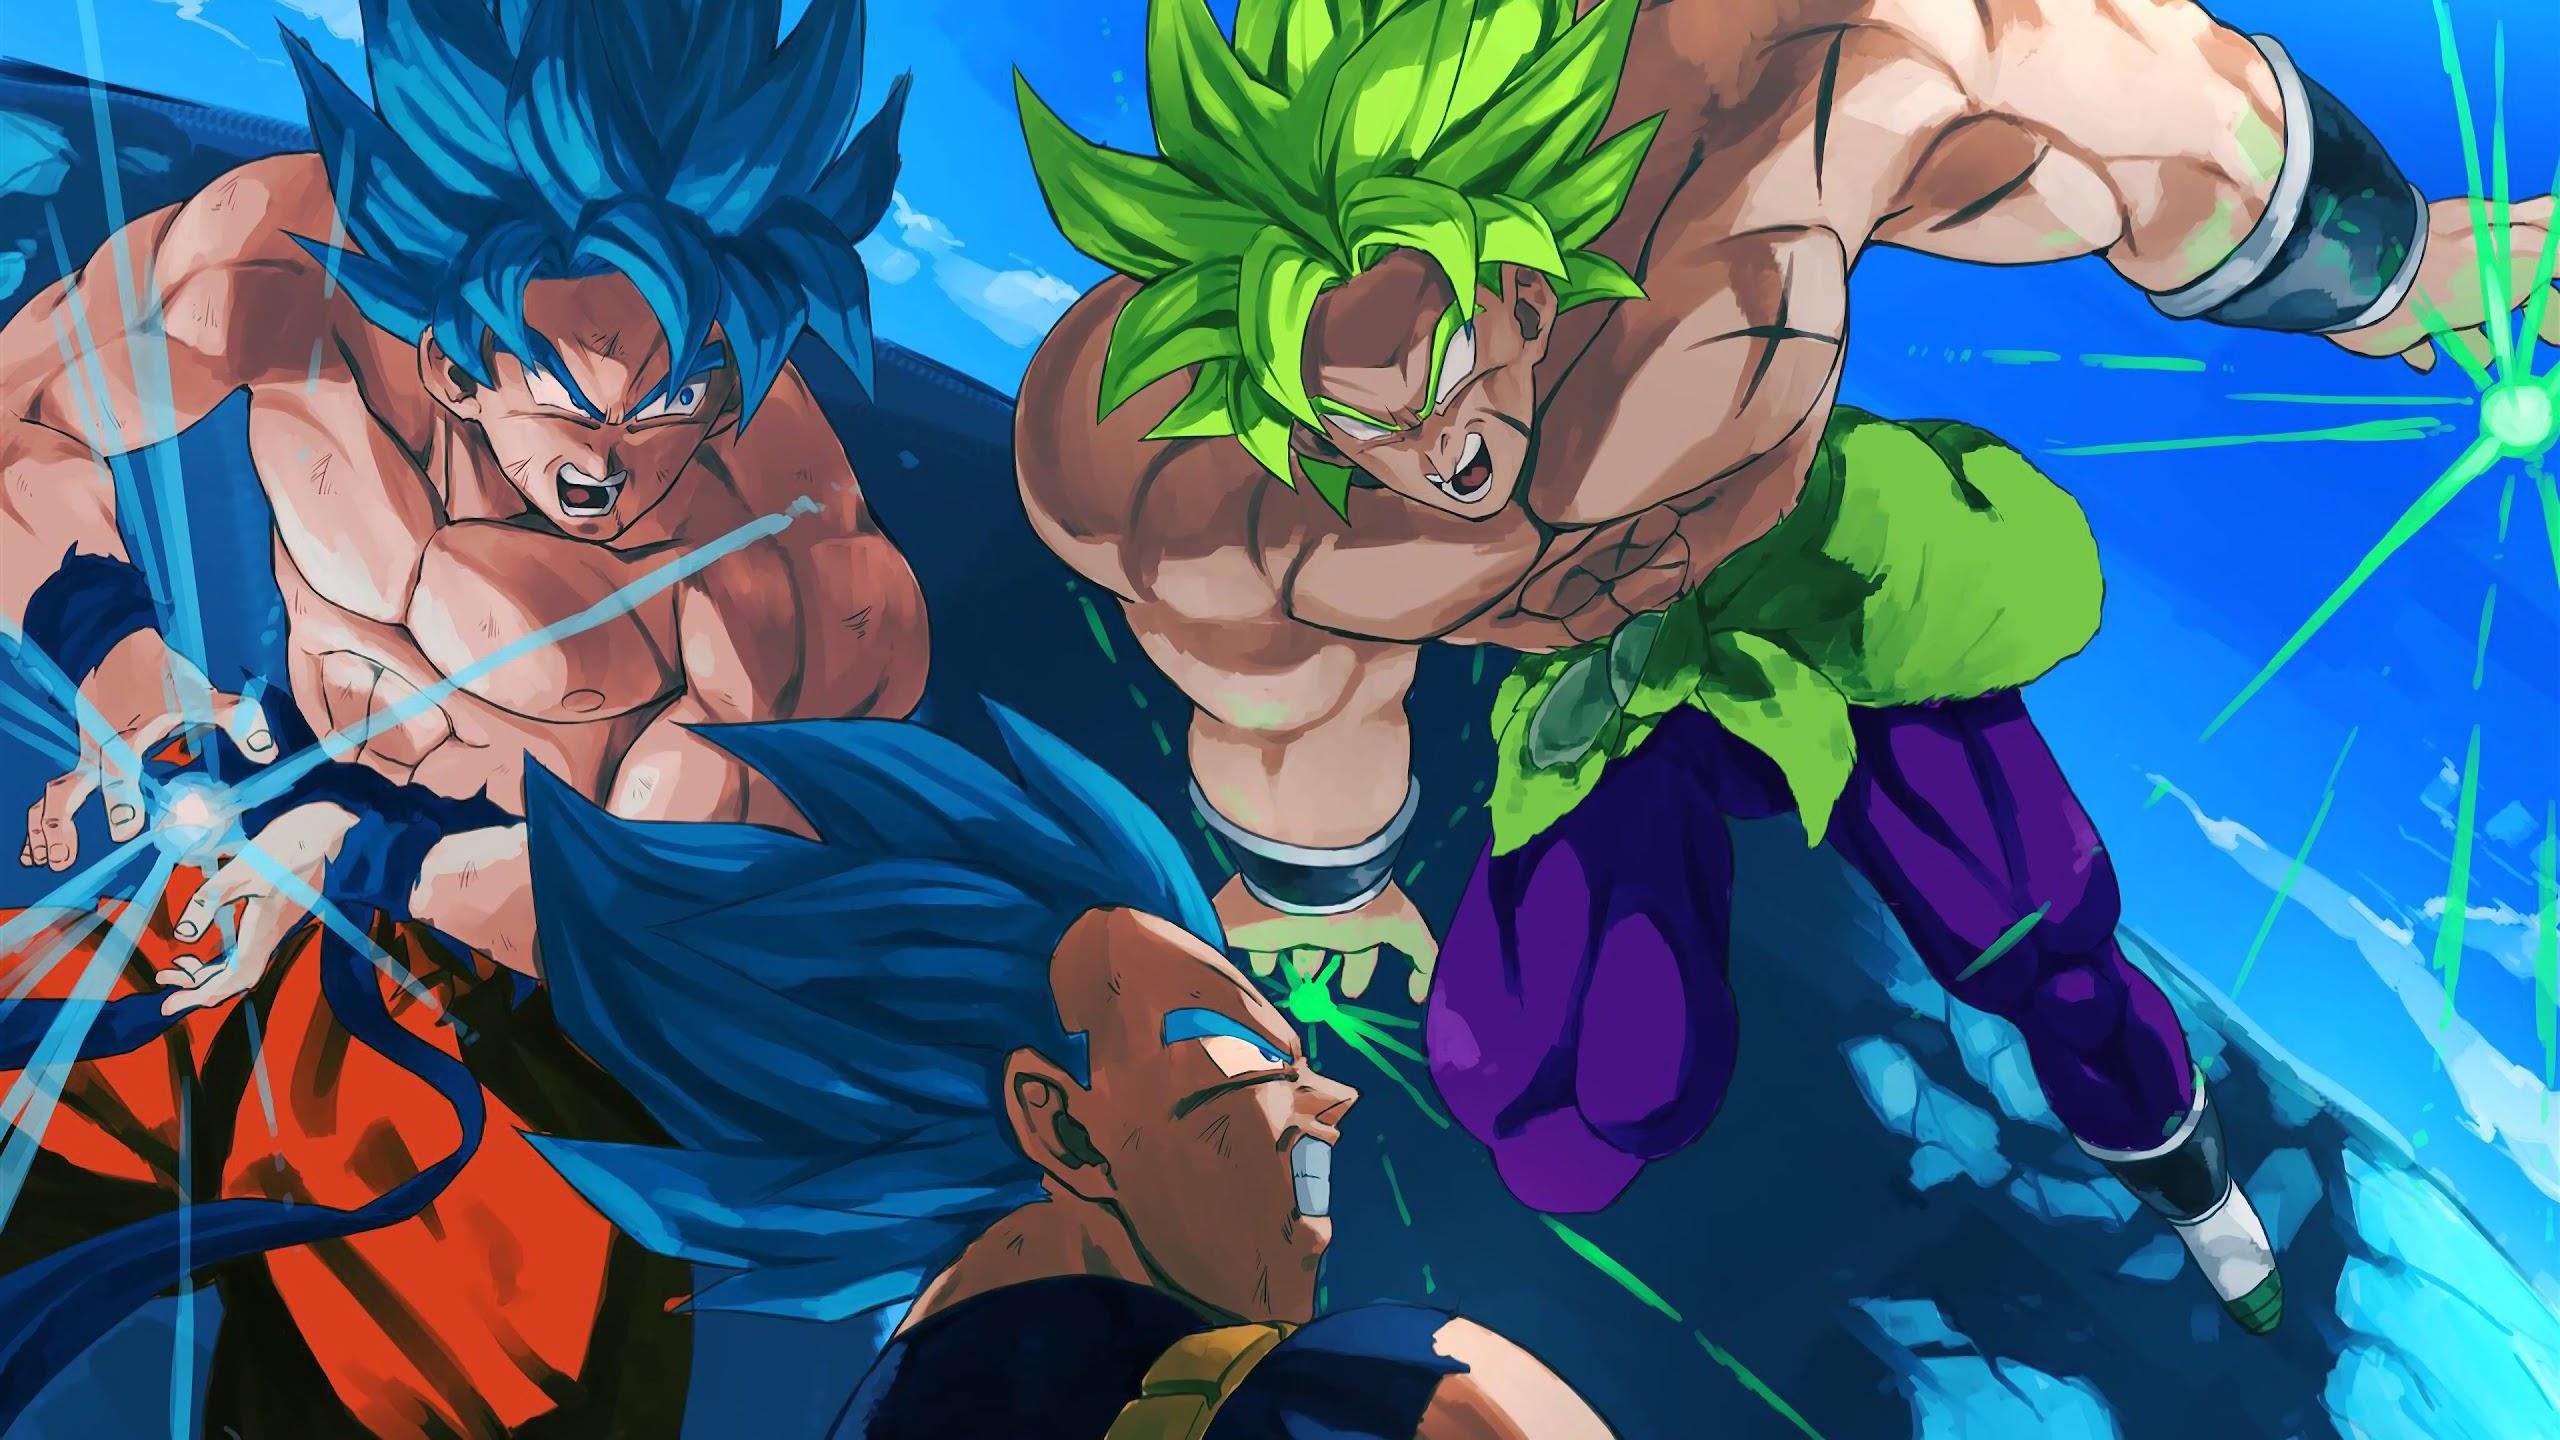 Dragon Ball Super Broly Goku Vegeta 4k 3840x2160 Wallpaper 23